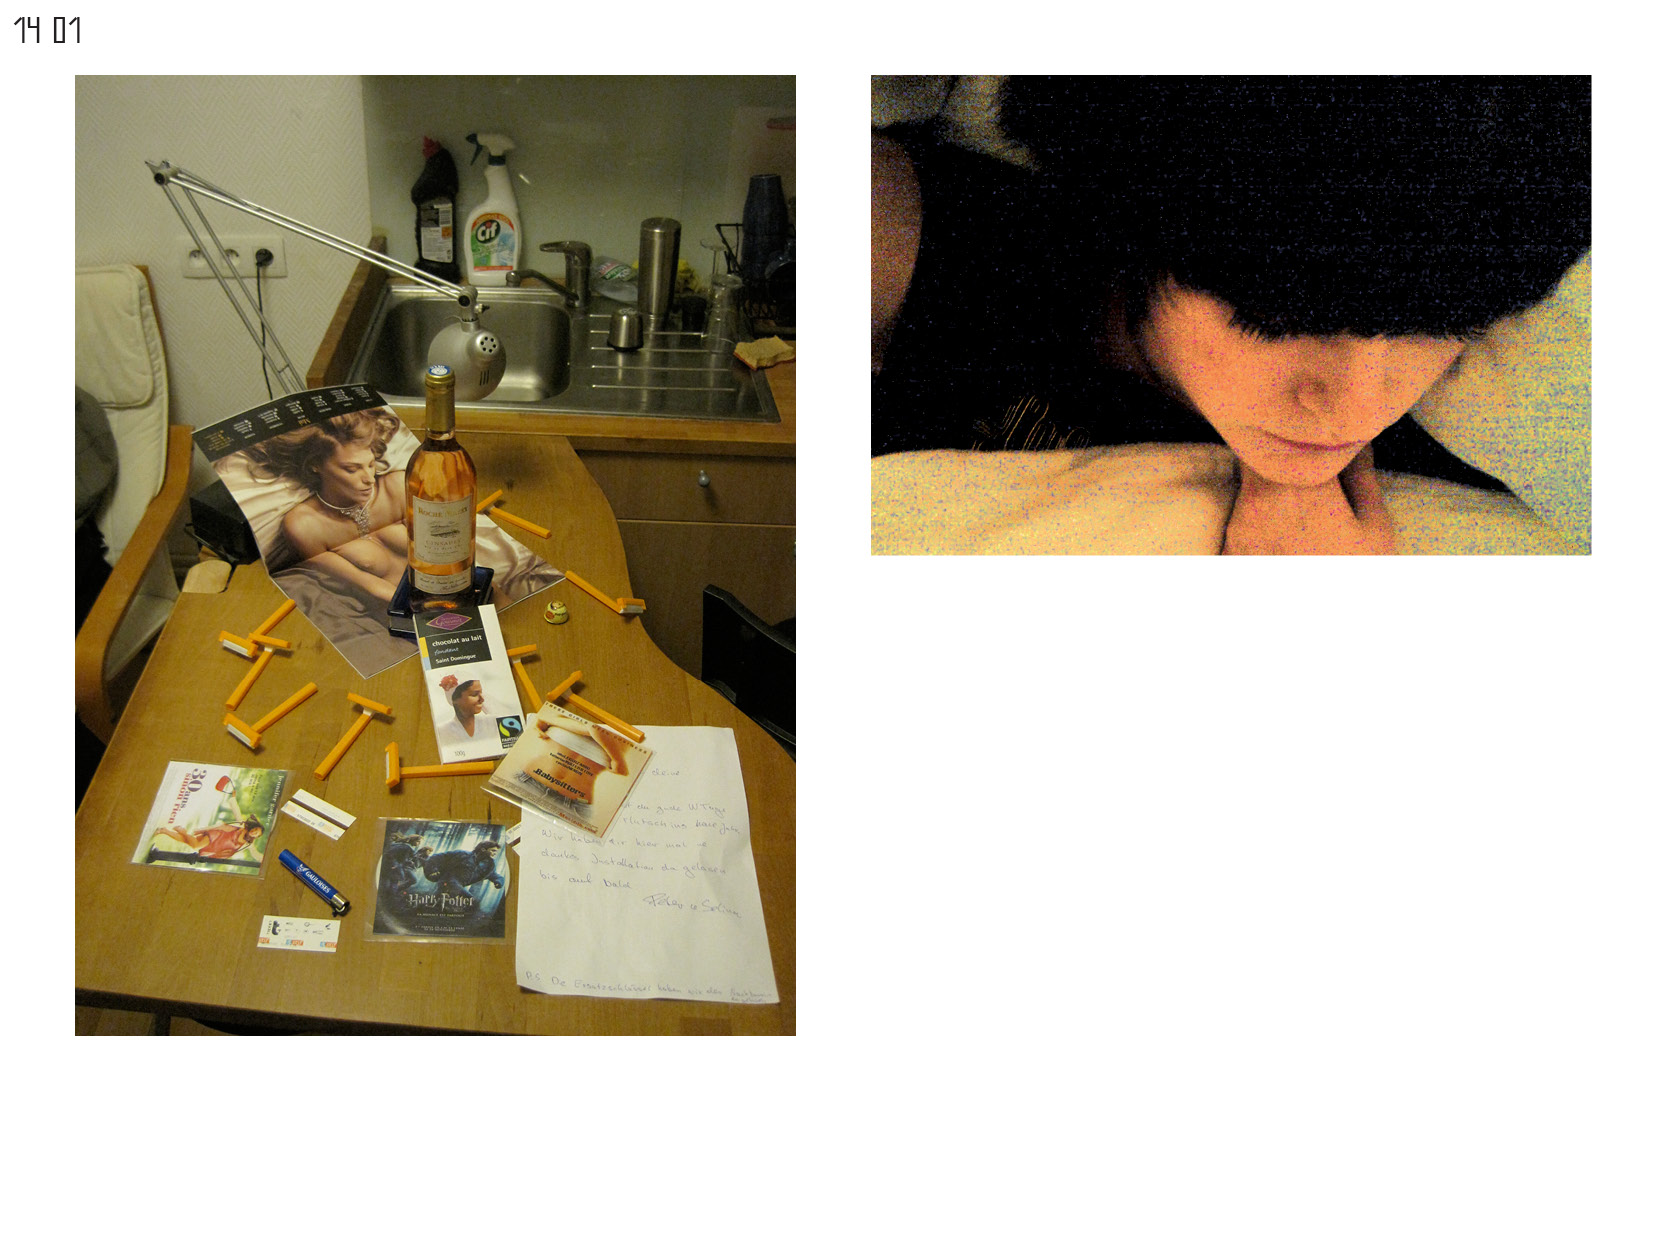 Gerrit-Schweiger-Dialog-Städte-Paris-Berlin-Jessica-Blank-Experiment-Fotoserie-Tagebuch-visuelle-Kommunikation-75